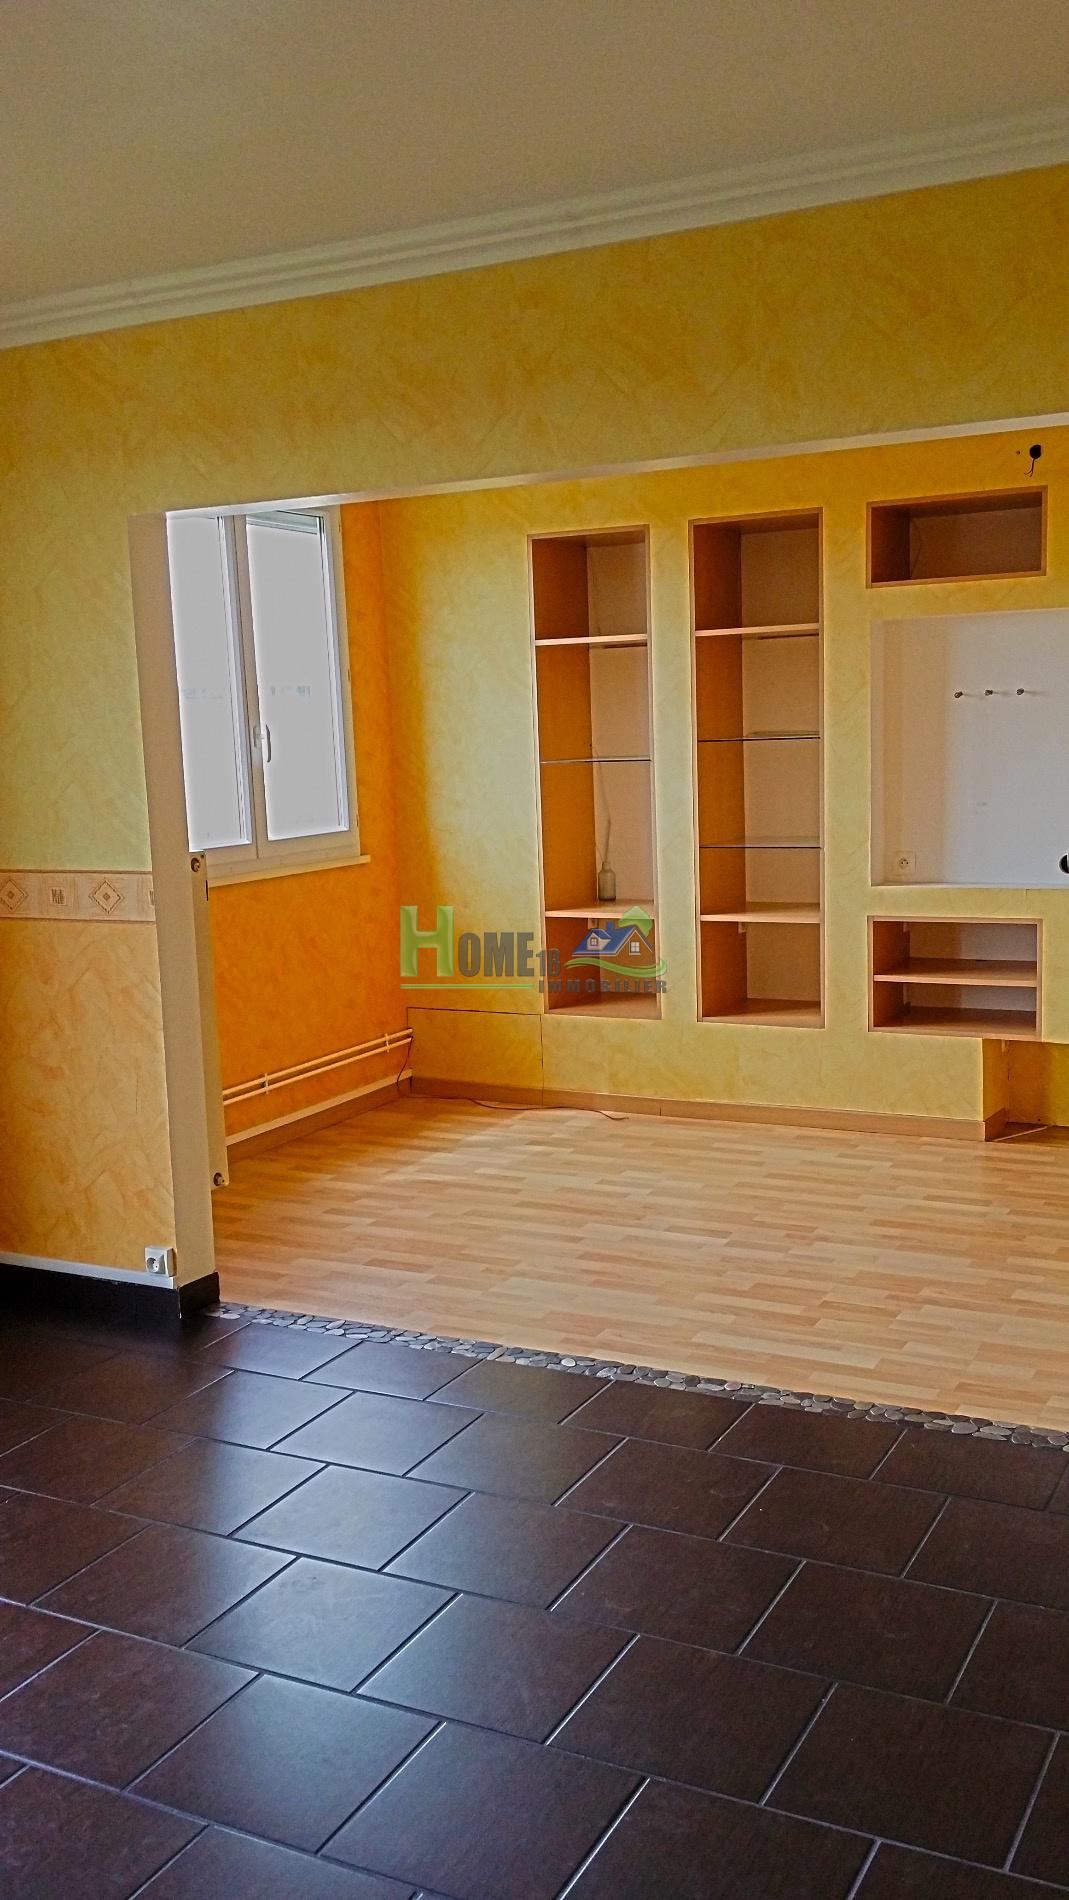 Vente bourges bel appartement f4 garage for Appartement garage